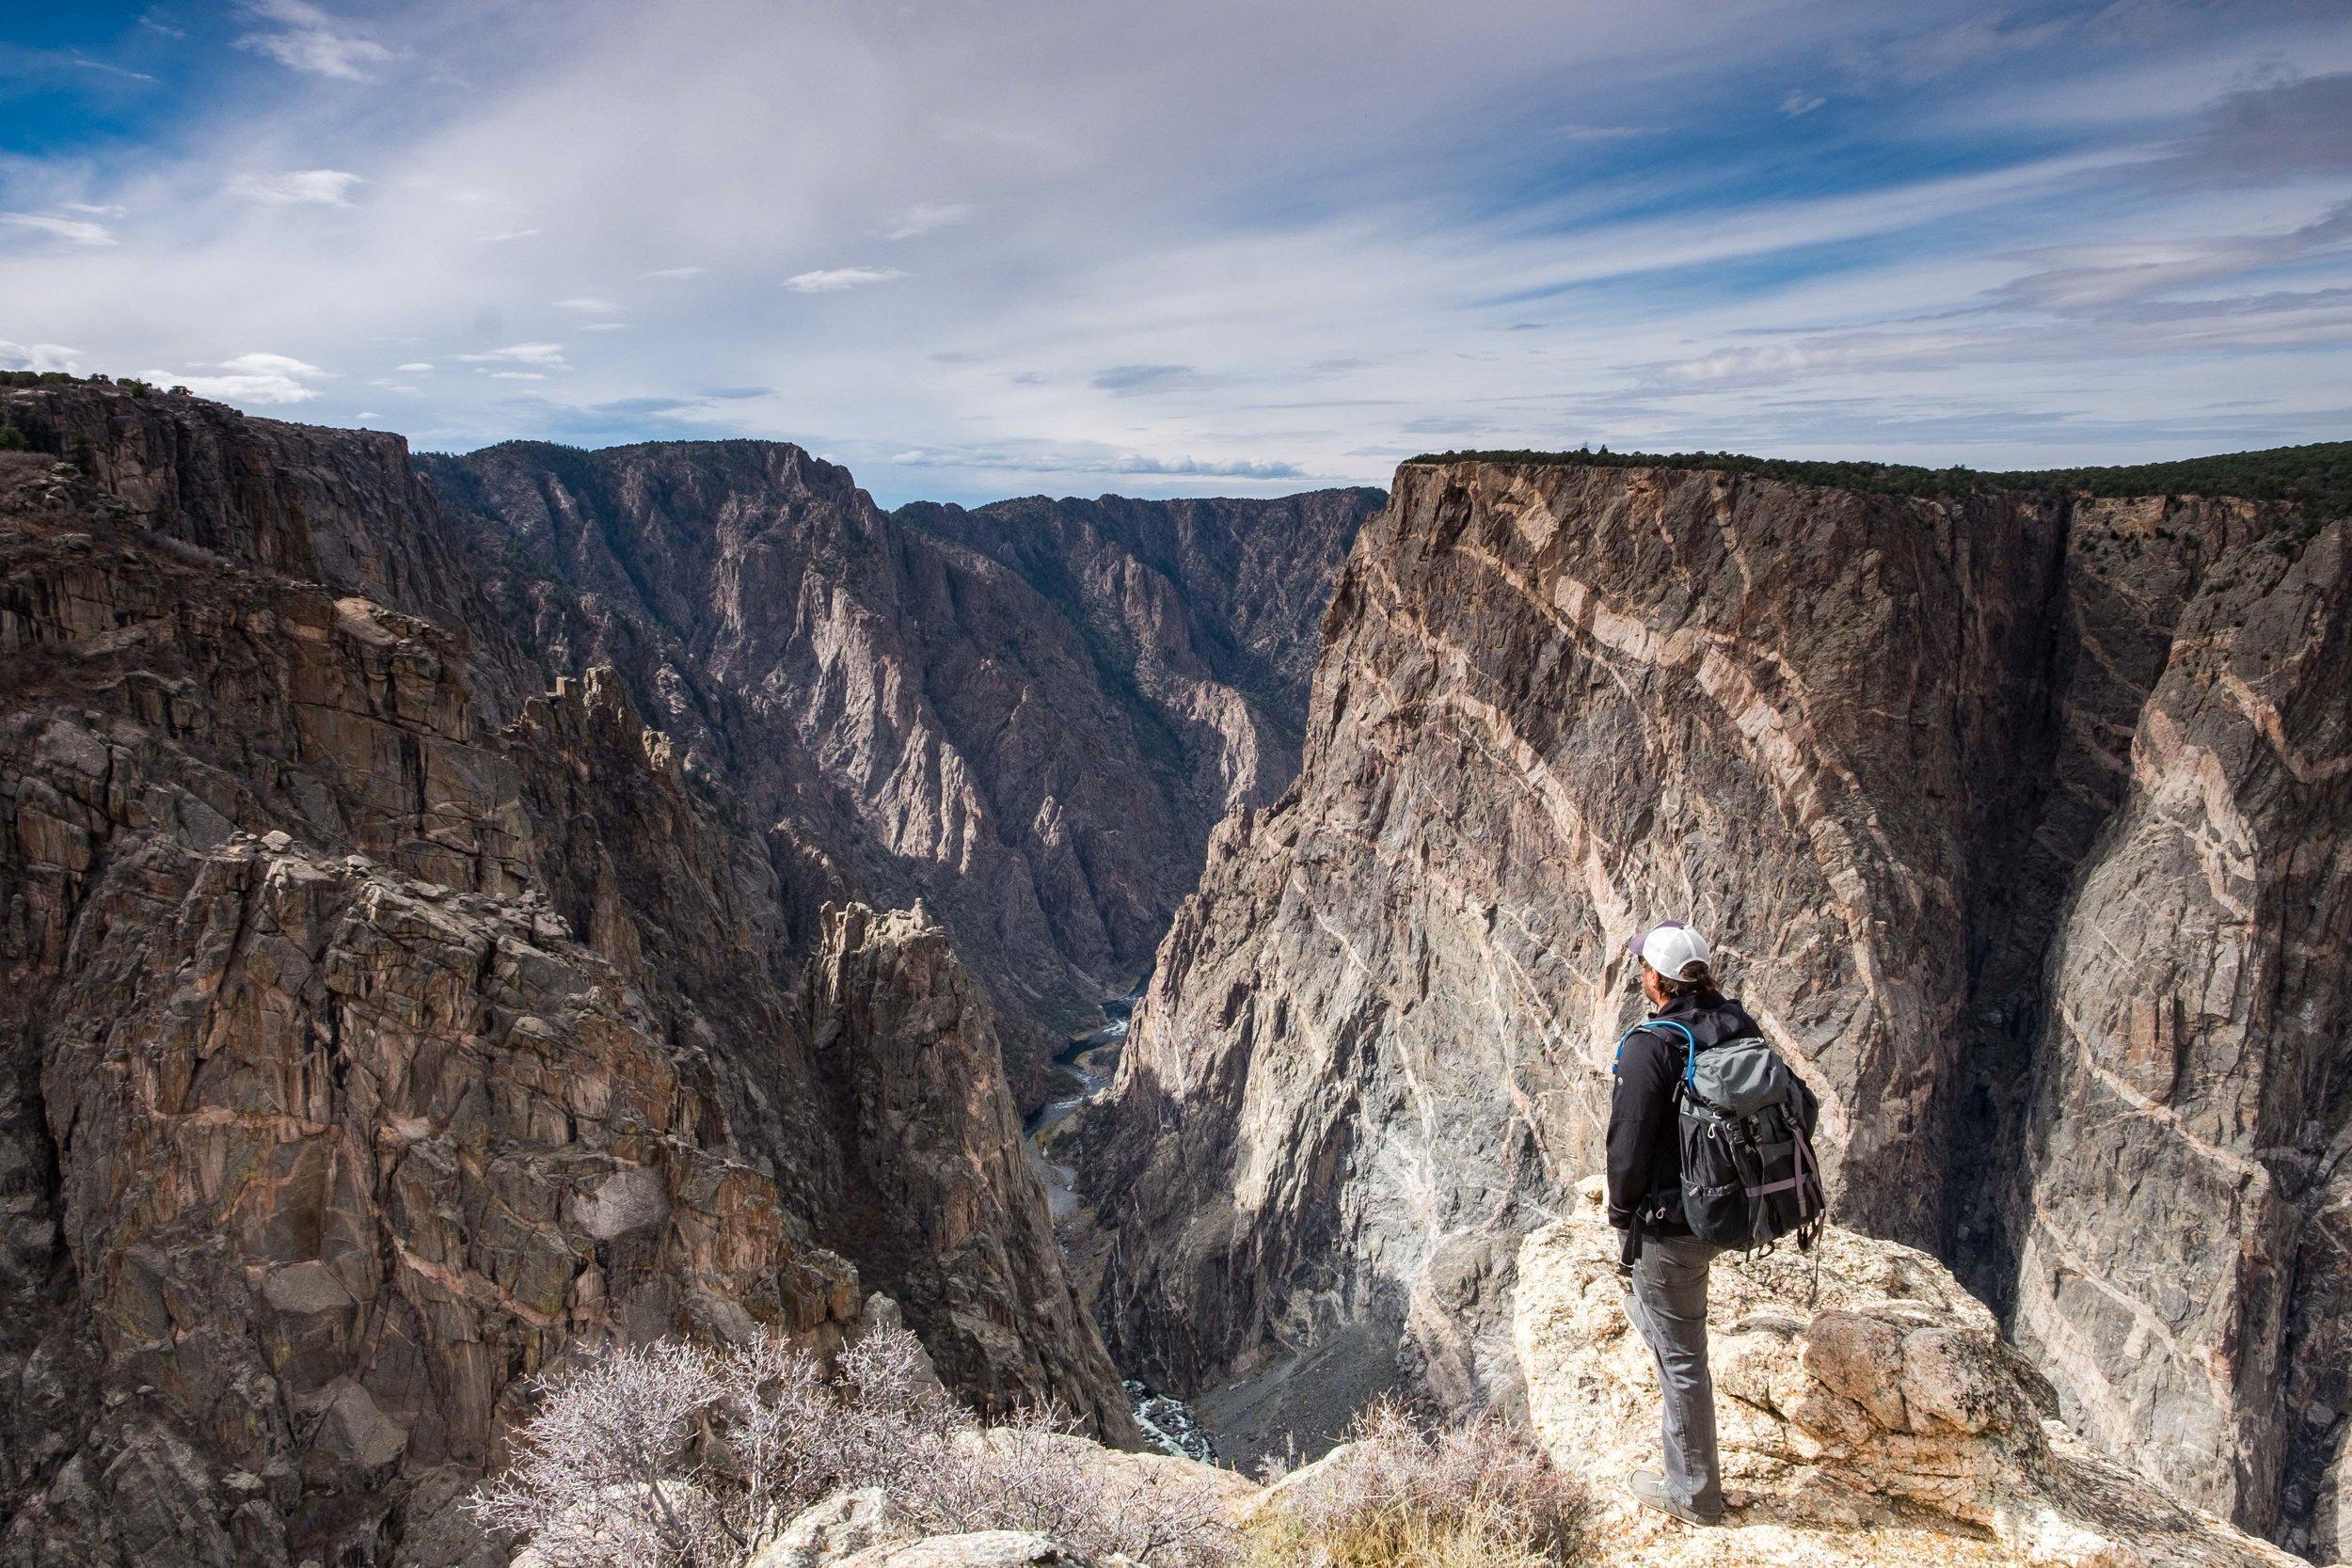 20161104-JI-Black Canyon of the Gunnison National Park-_DSF1223.jpg